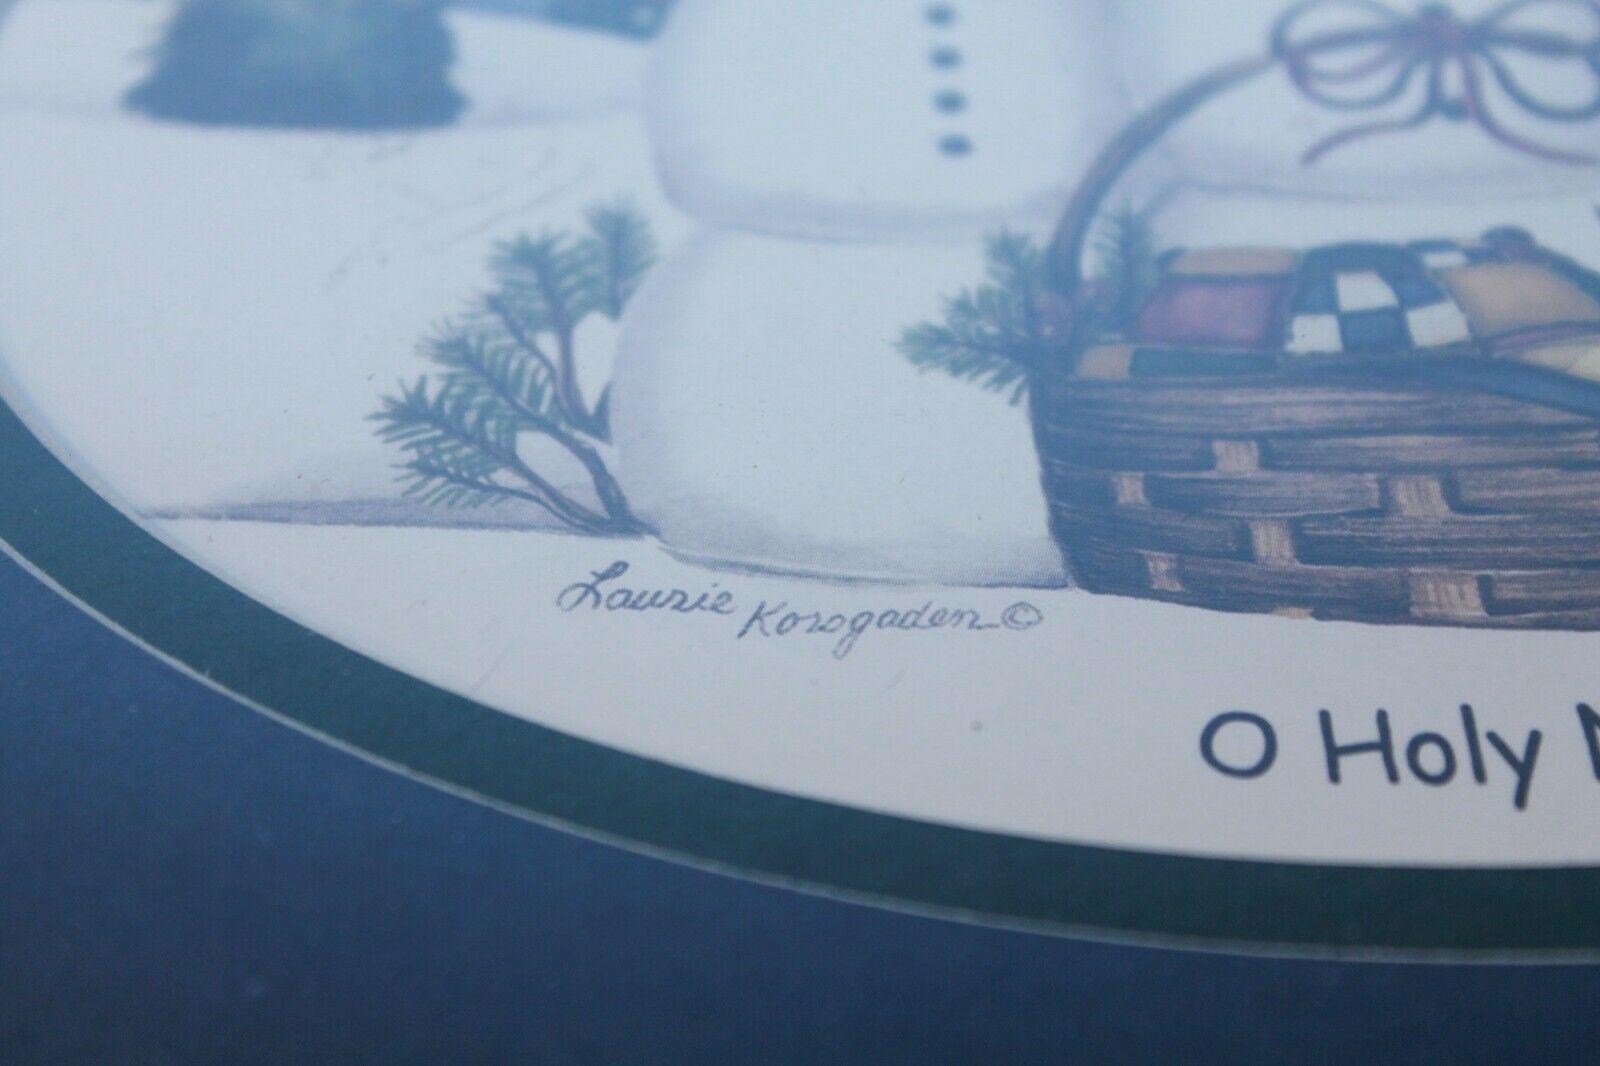 Framed Christmas Snowman Picture - Laurie Korsgaden